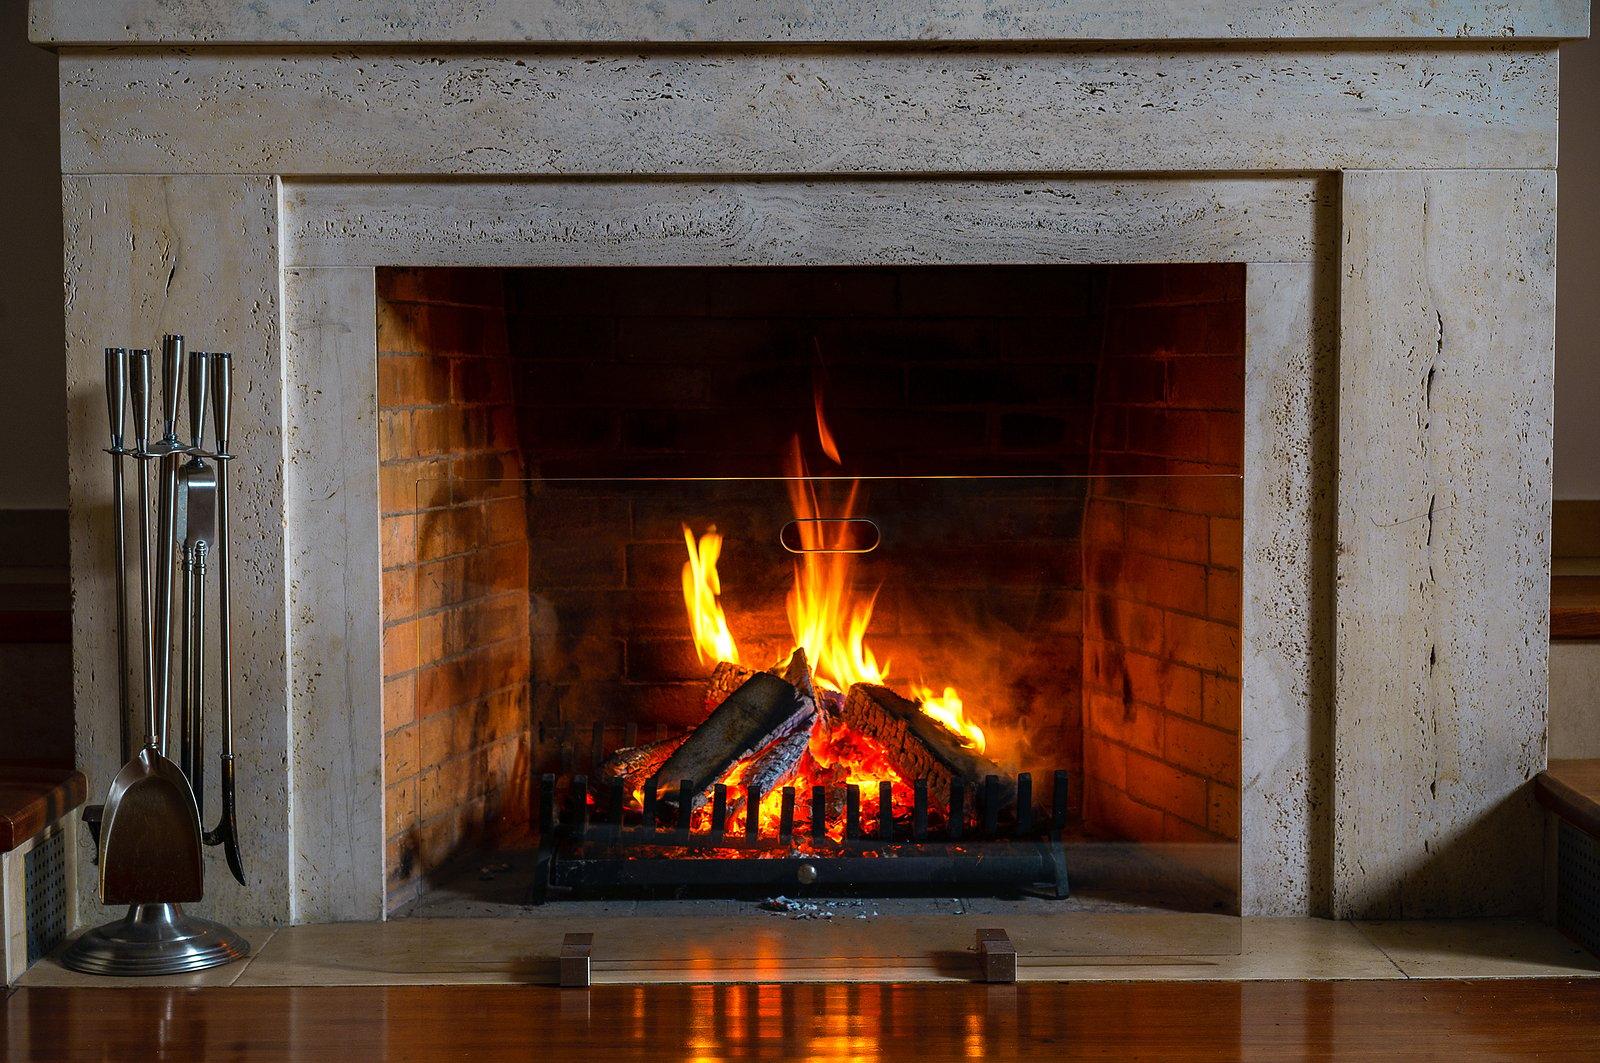 make-sure-fireplace-is-safe.jpg